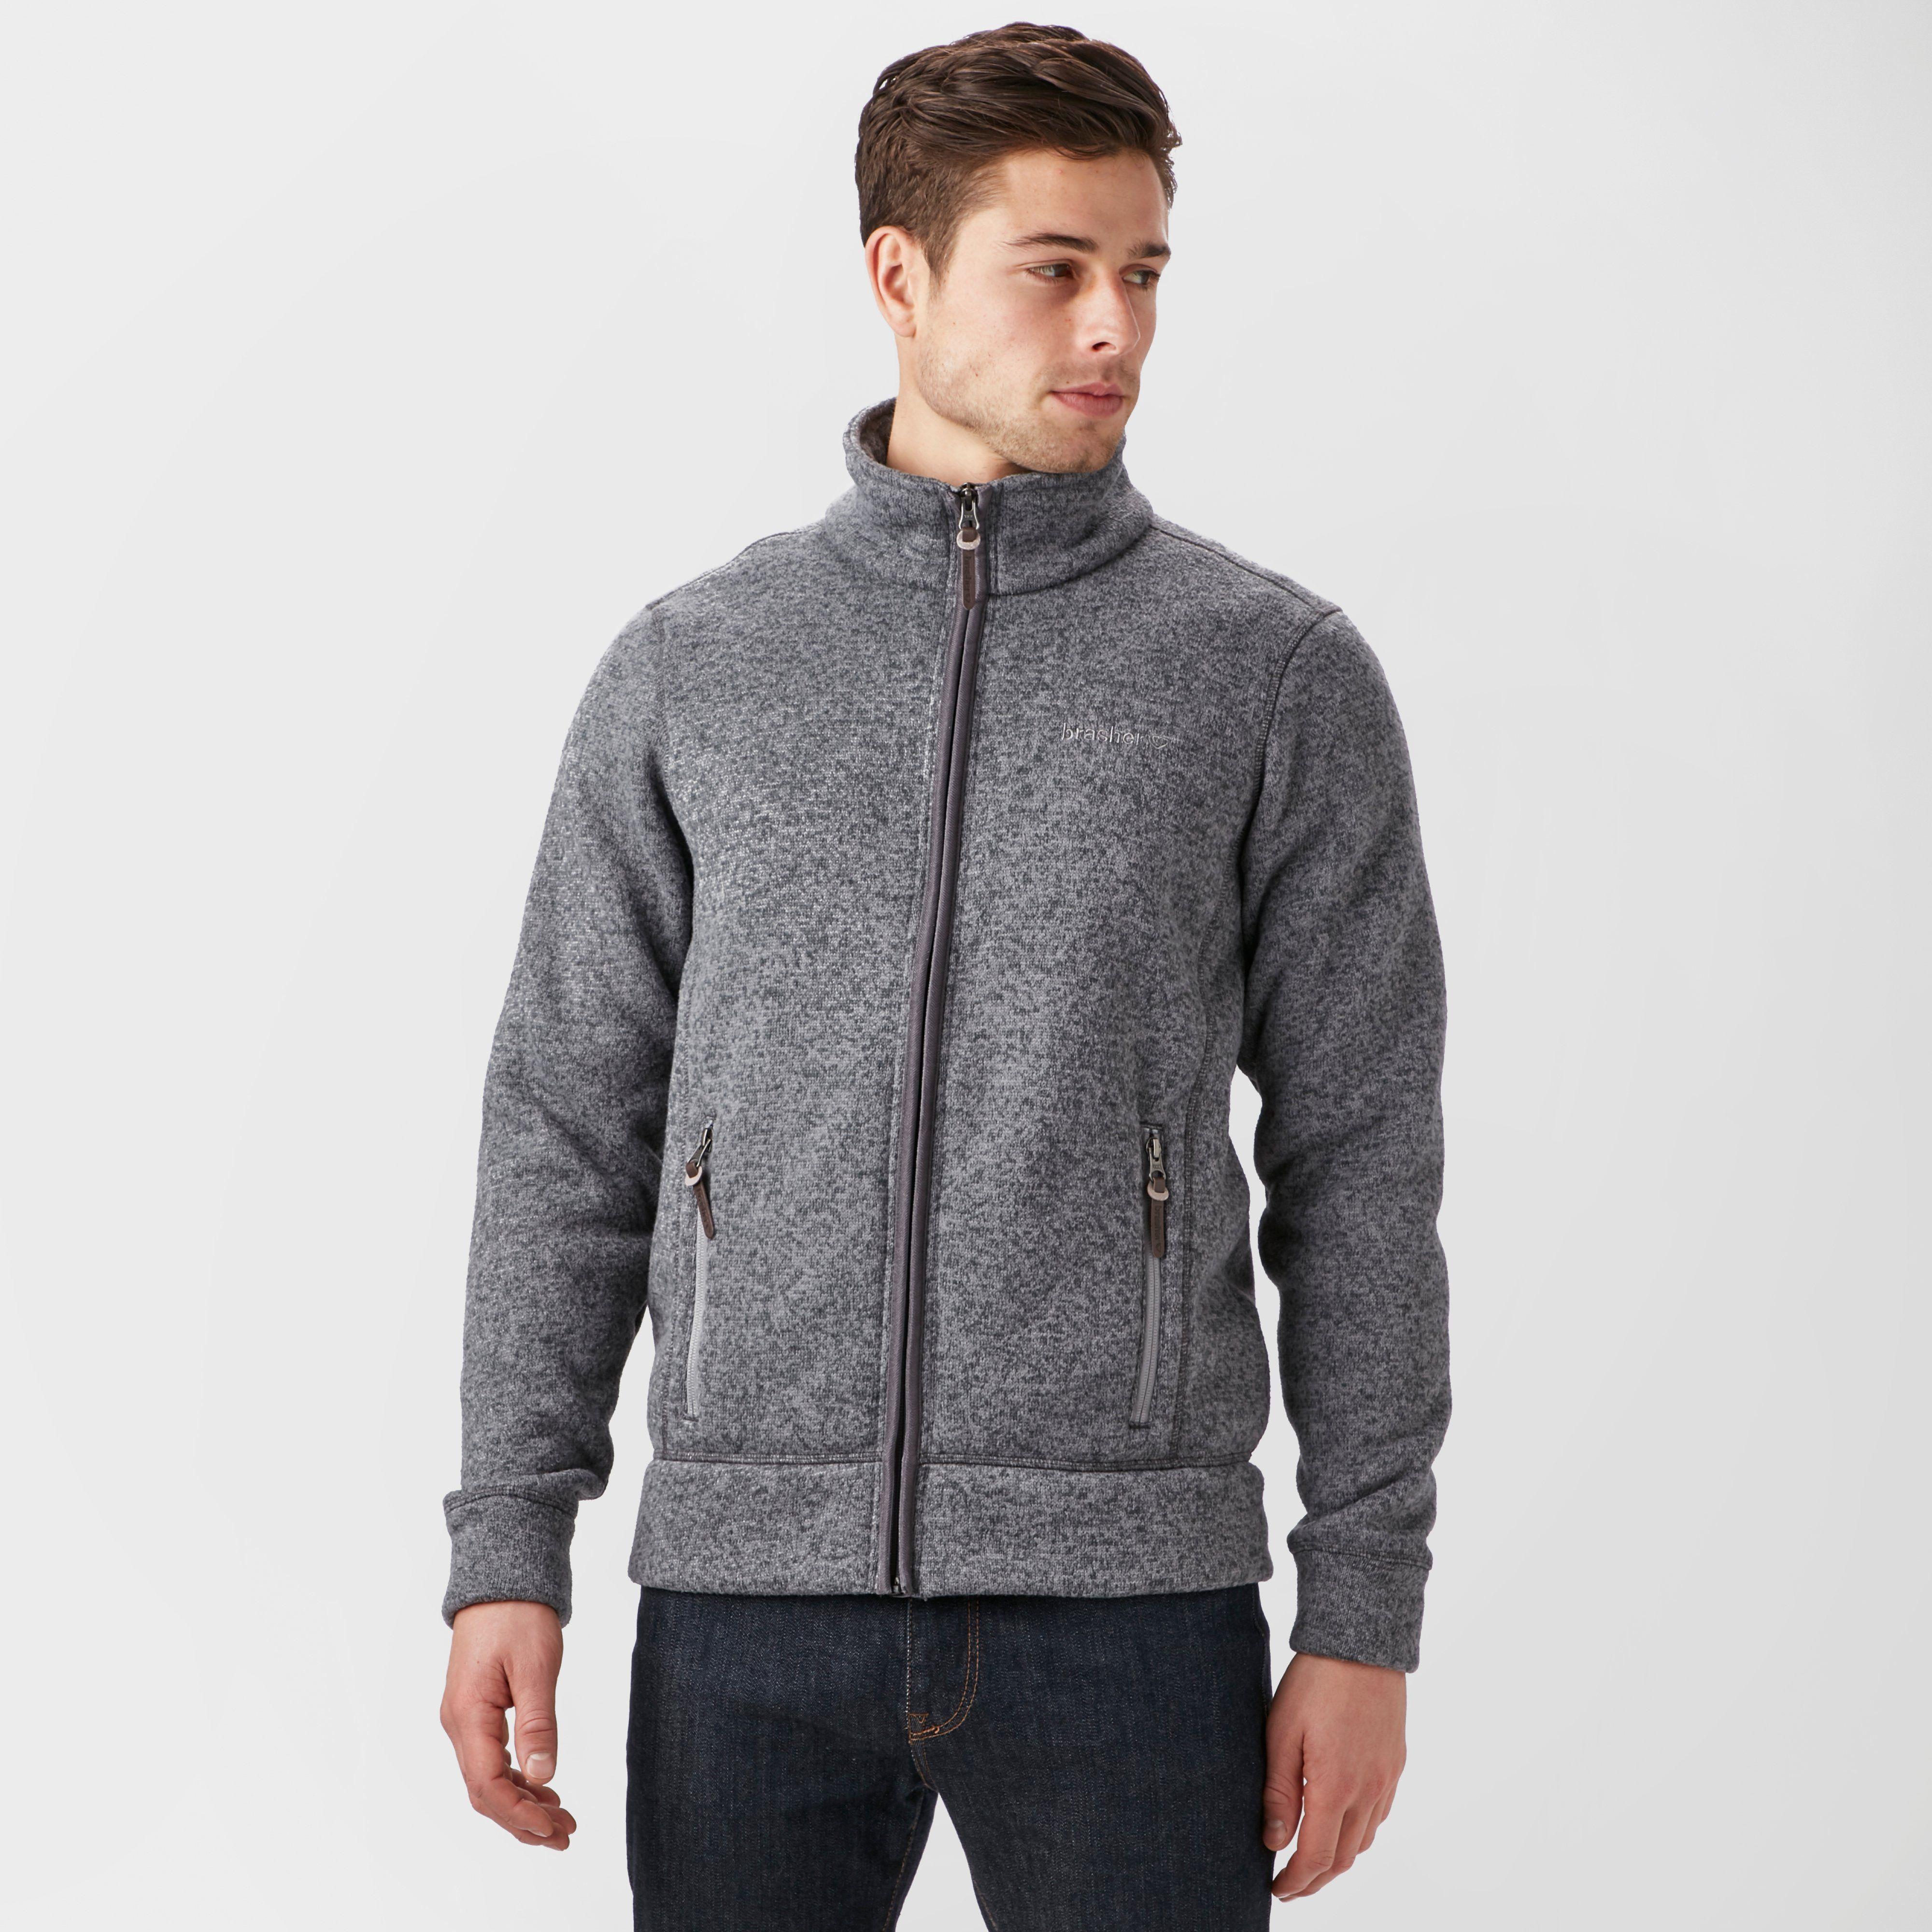 BRASHER Men's Rydal II Fleece Jacket